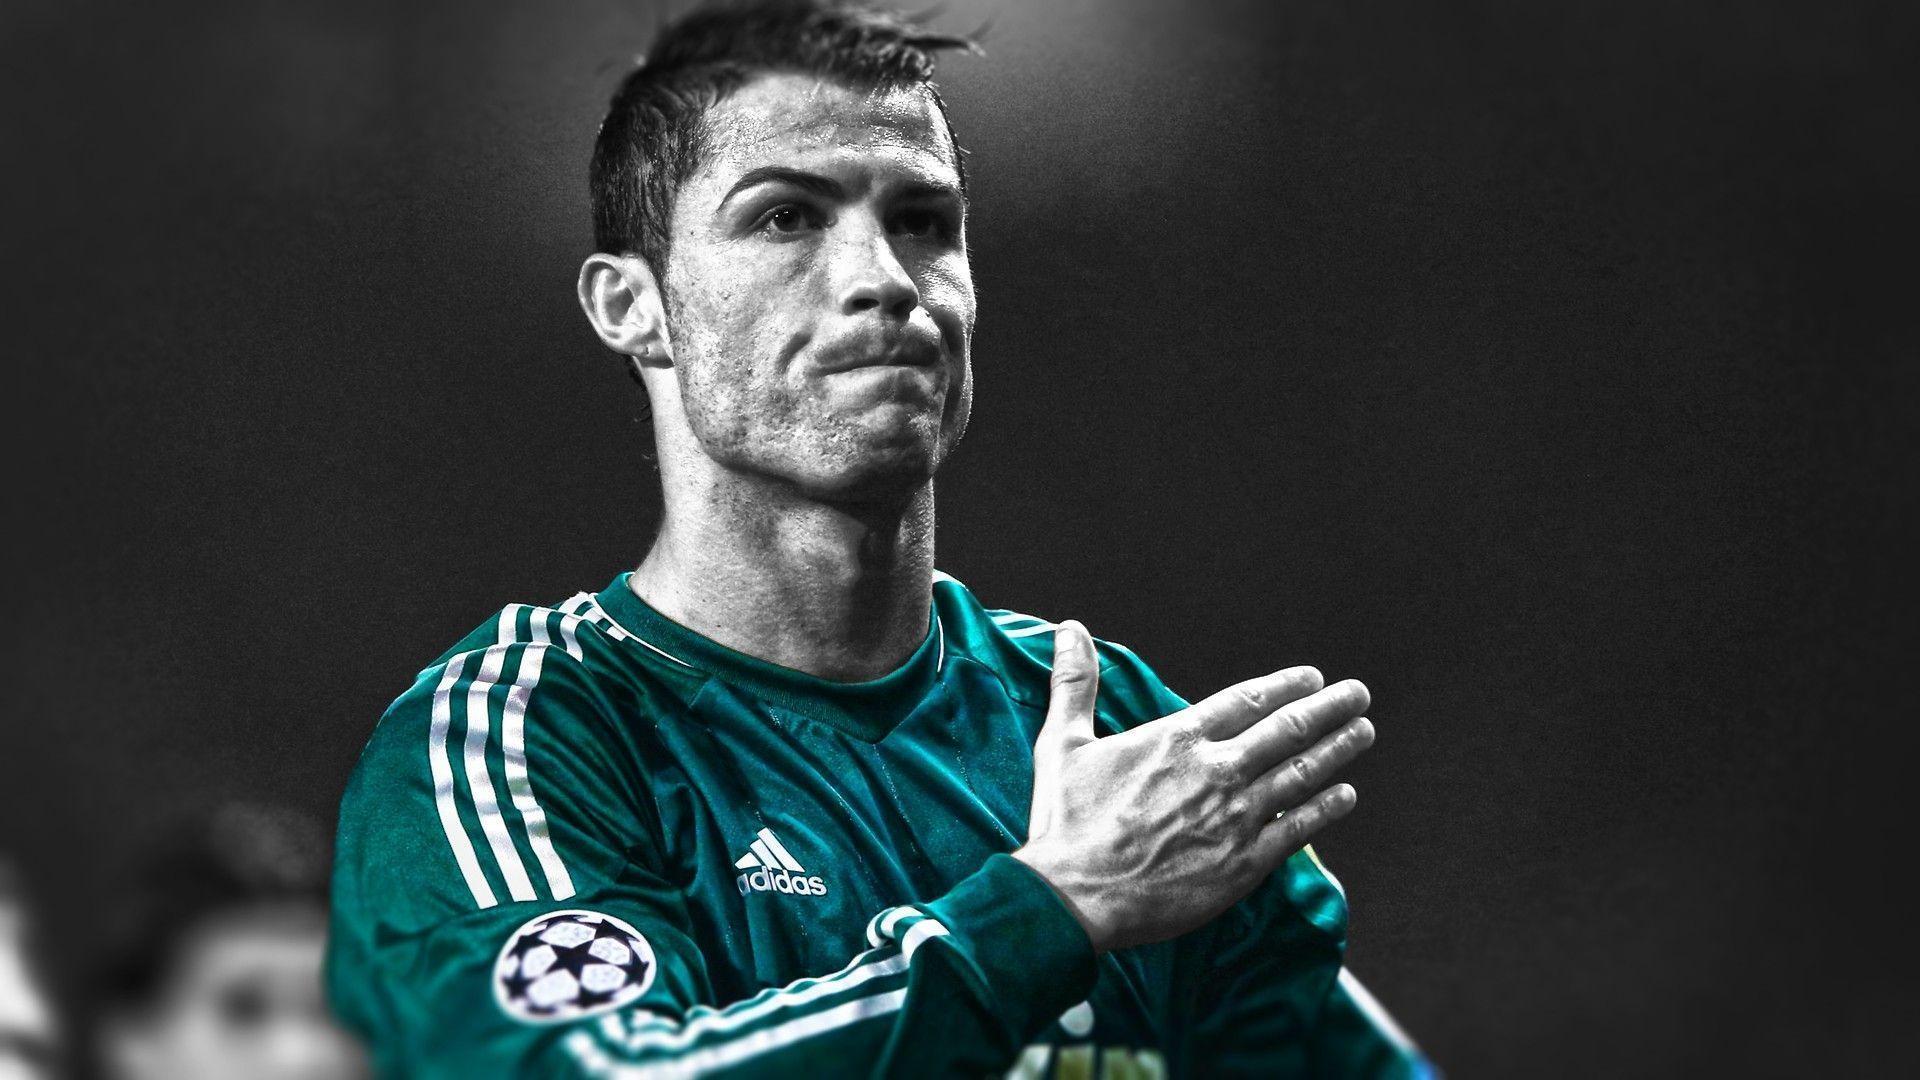 ronaldo football wallpapers hd - photo #42